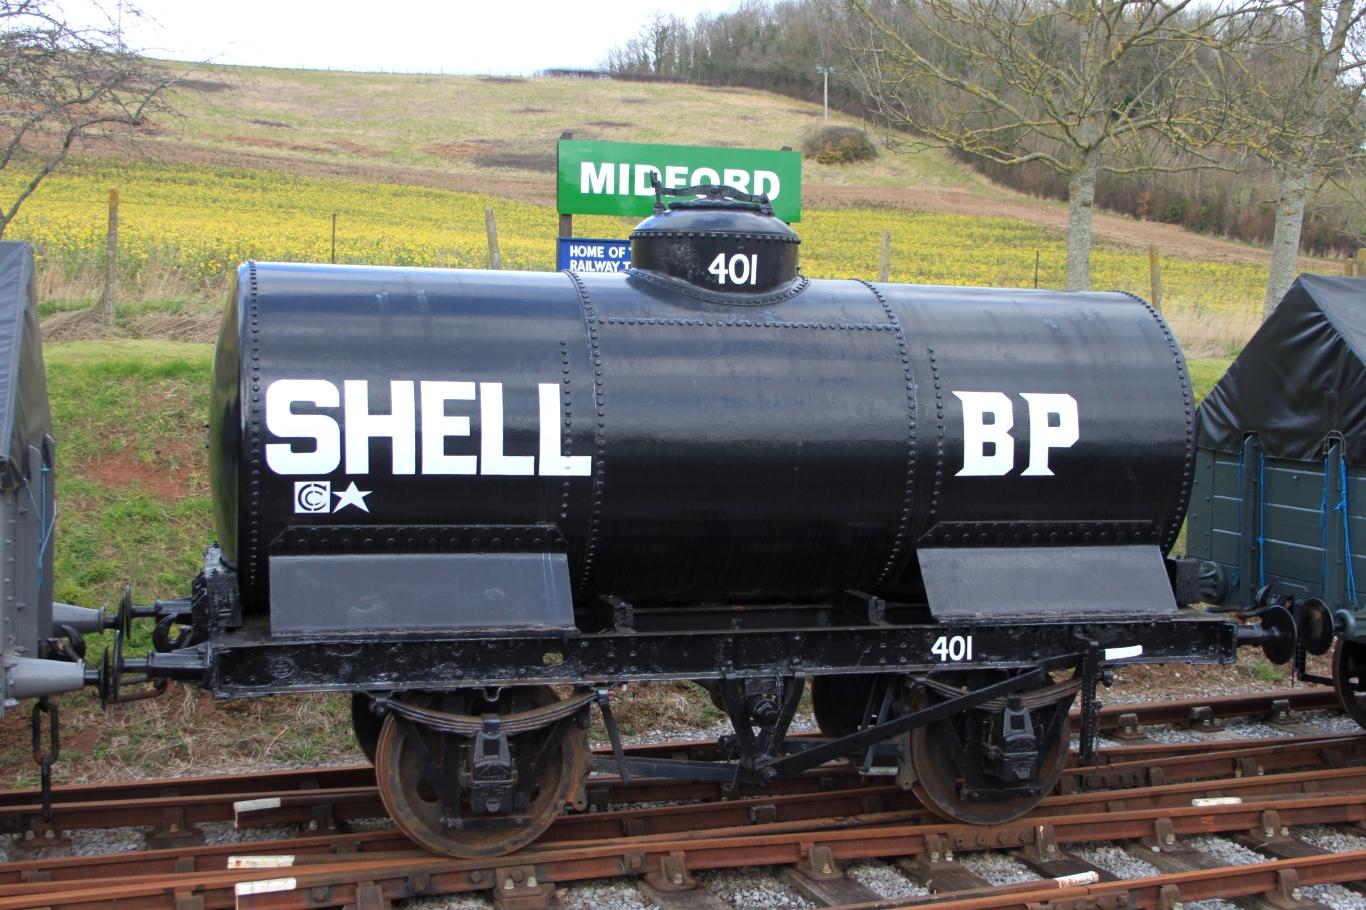 Bp Stock Chart: Shell-BP tank wagon 401 at Washford.JPG - Wikimedia Commons,Chart